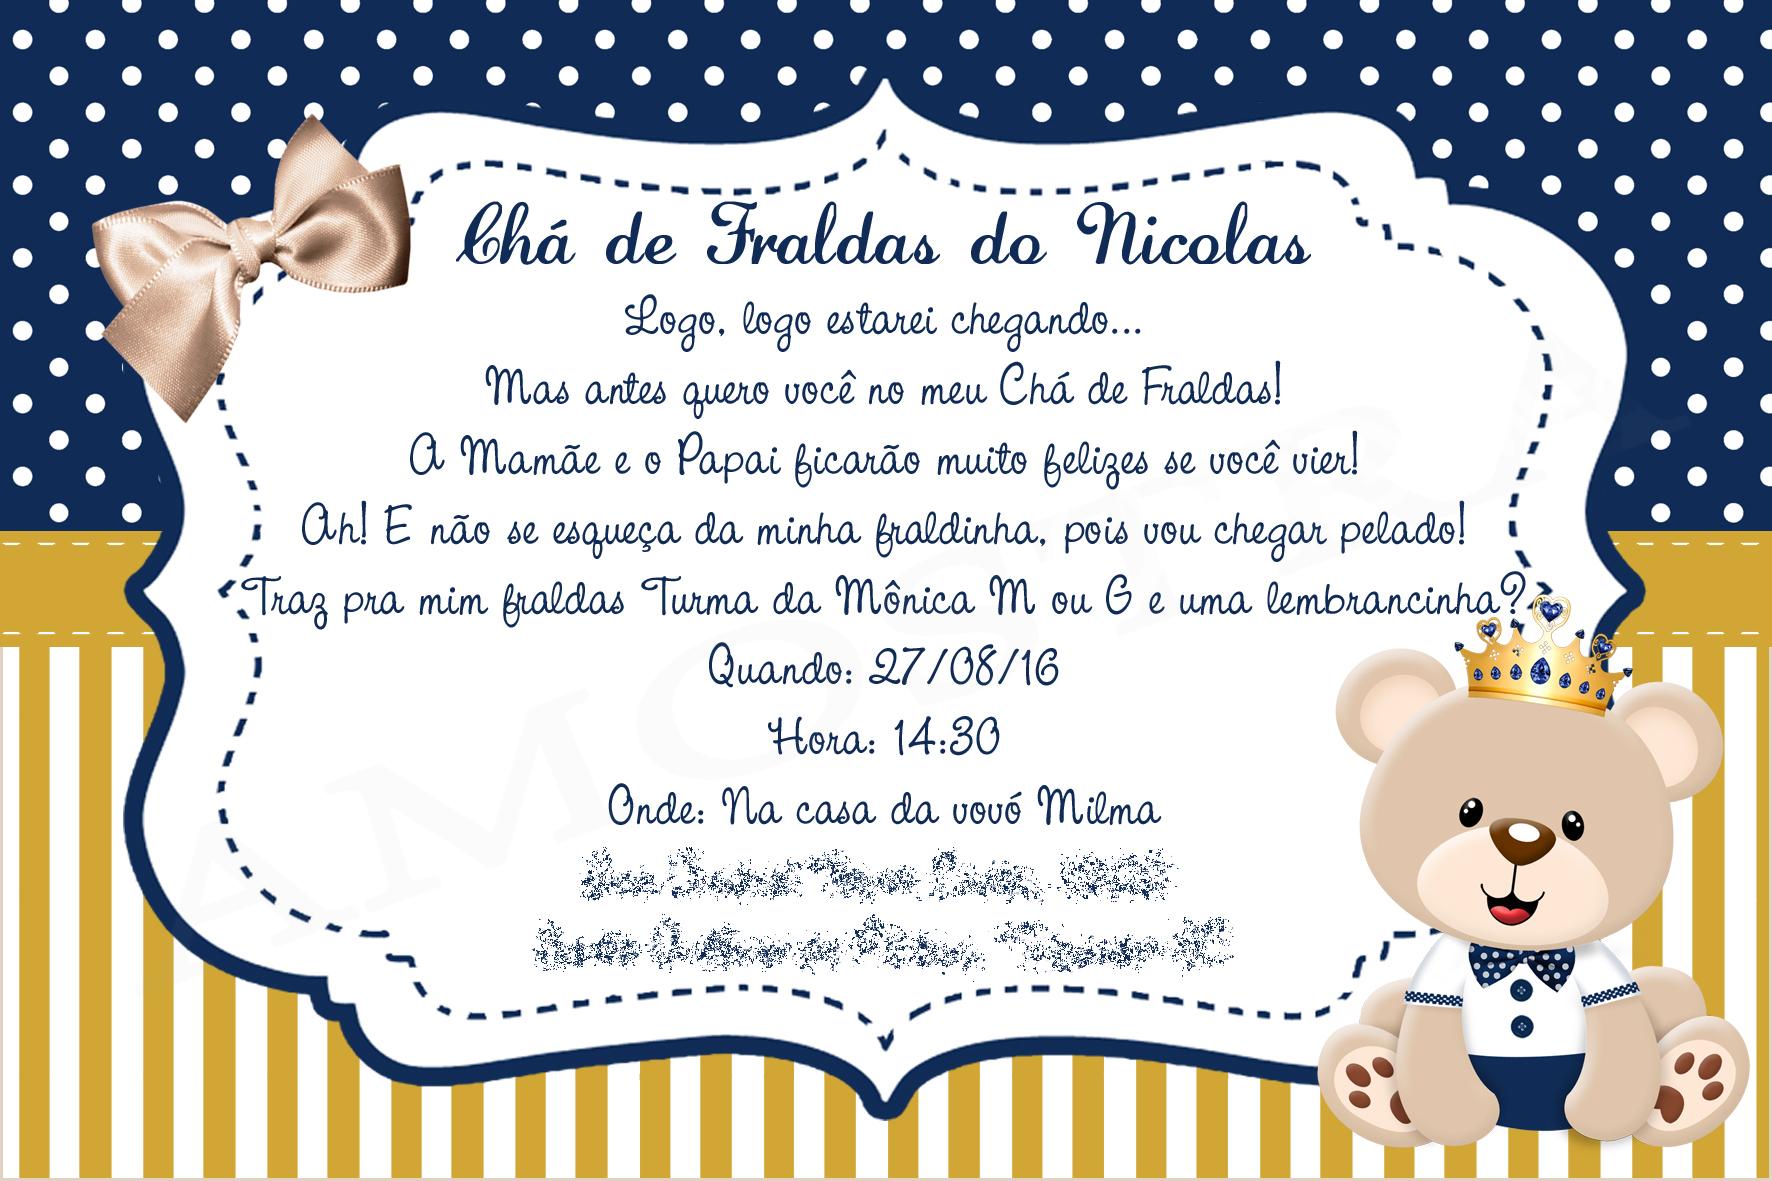 Convite Digital Cha De Fraldas Gemeos Princesas Coroa Elo7